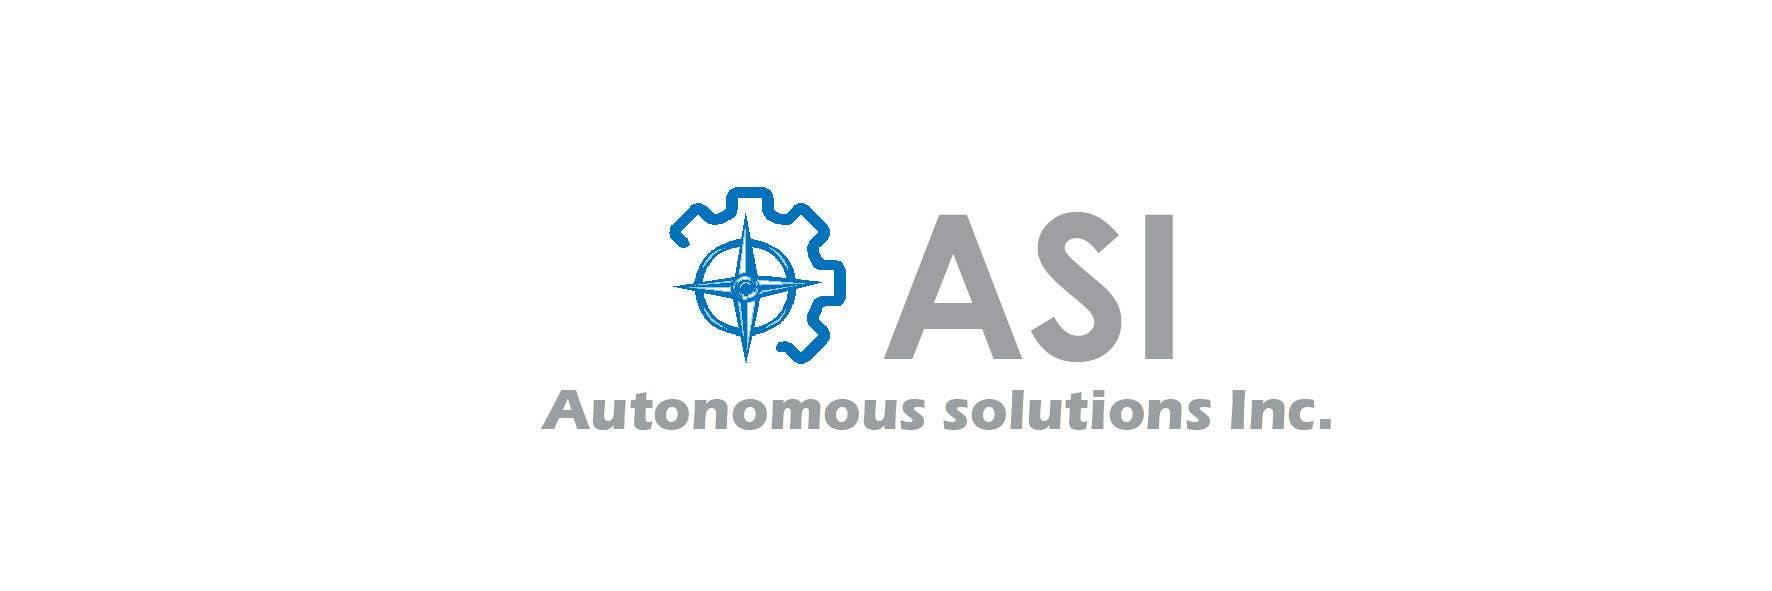 Entri Kontes #67 untukLogo Design for Autonomous Solutions Inc.